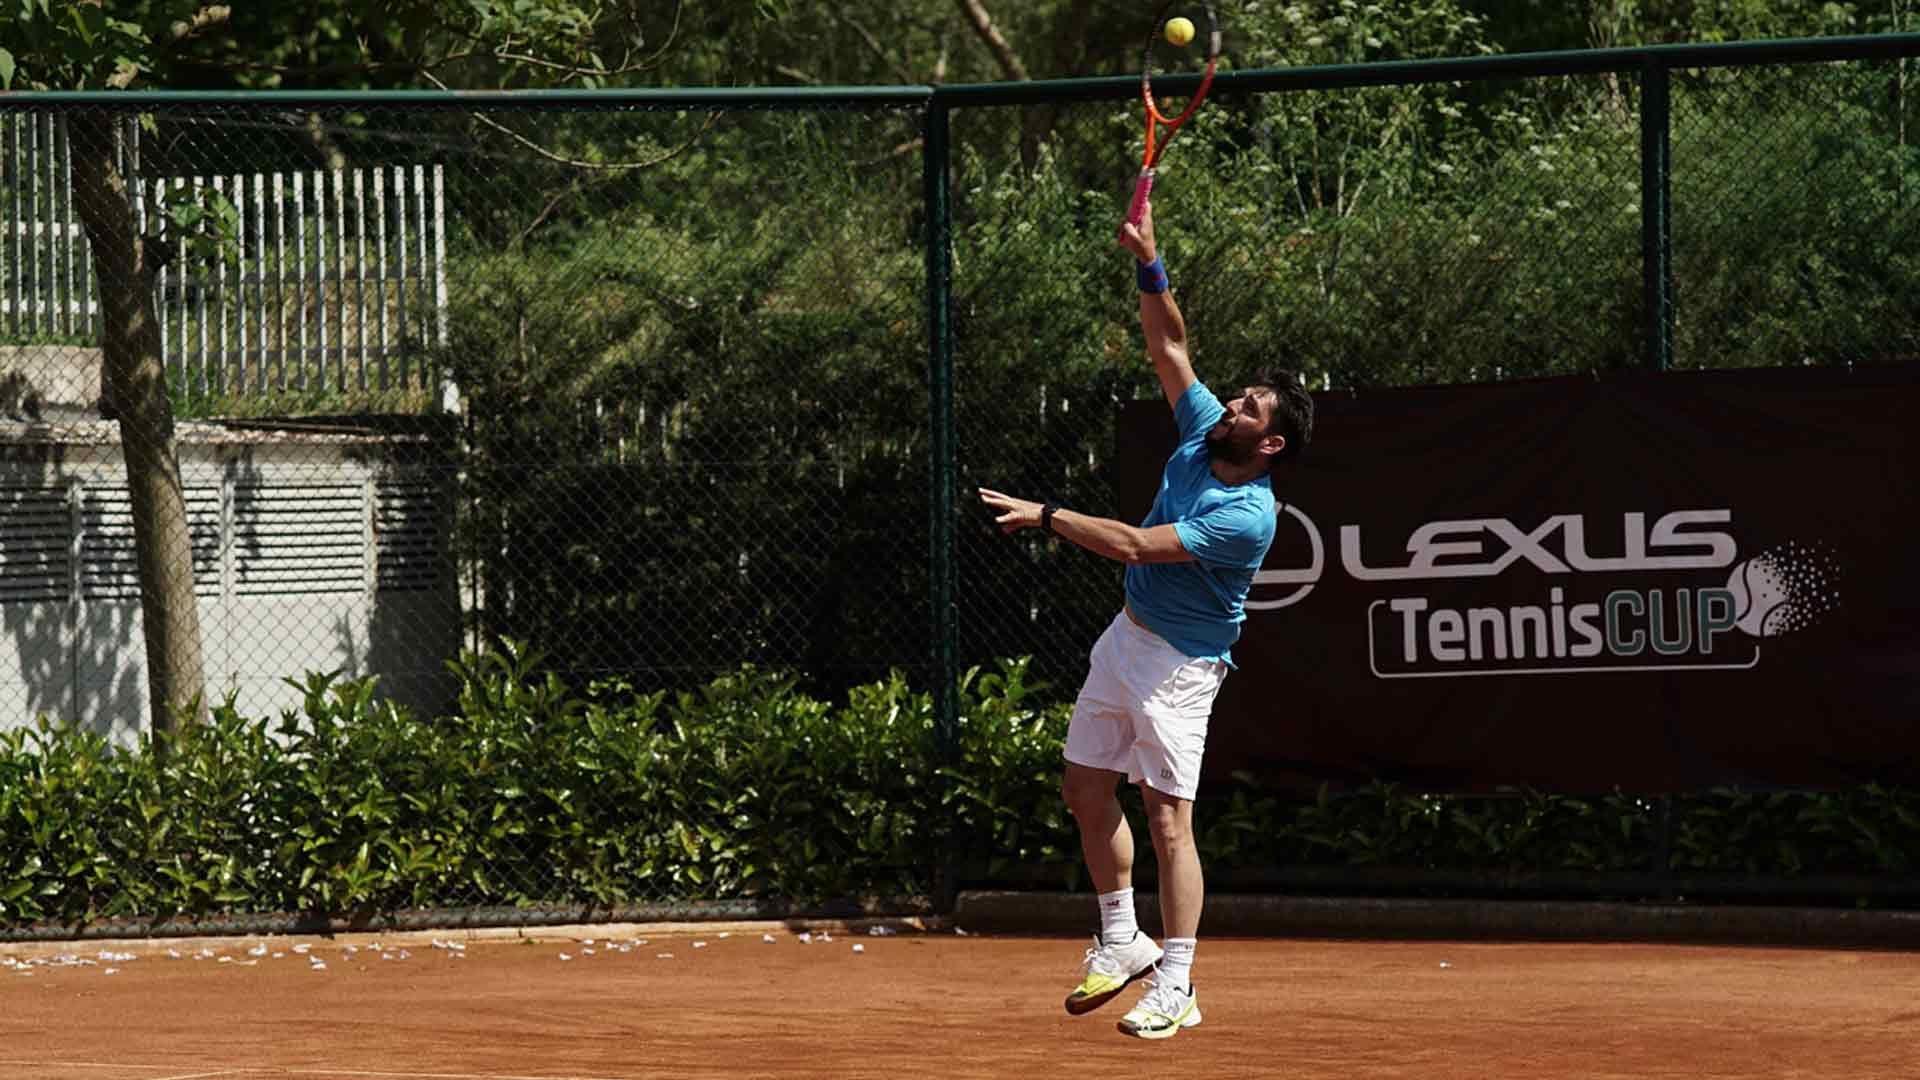 Lexus Tennis Cup gallery05